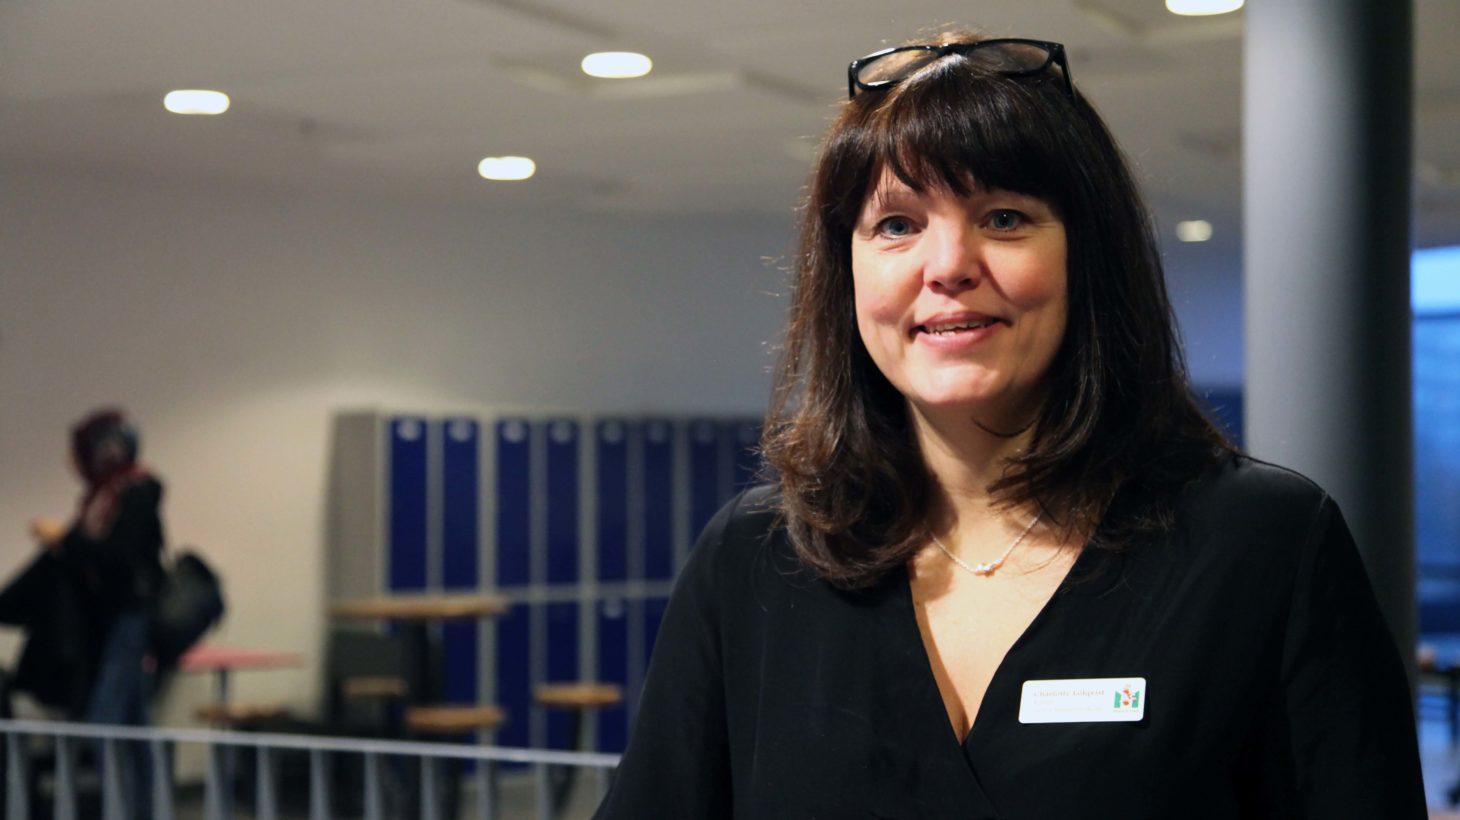 Charlotte Löfqvist står i kapprum på skola.